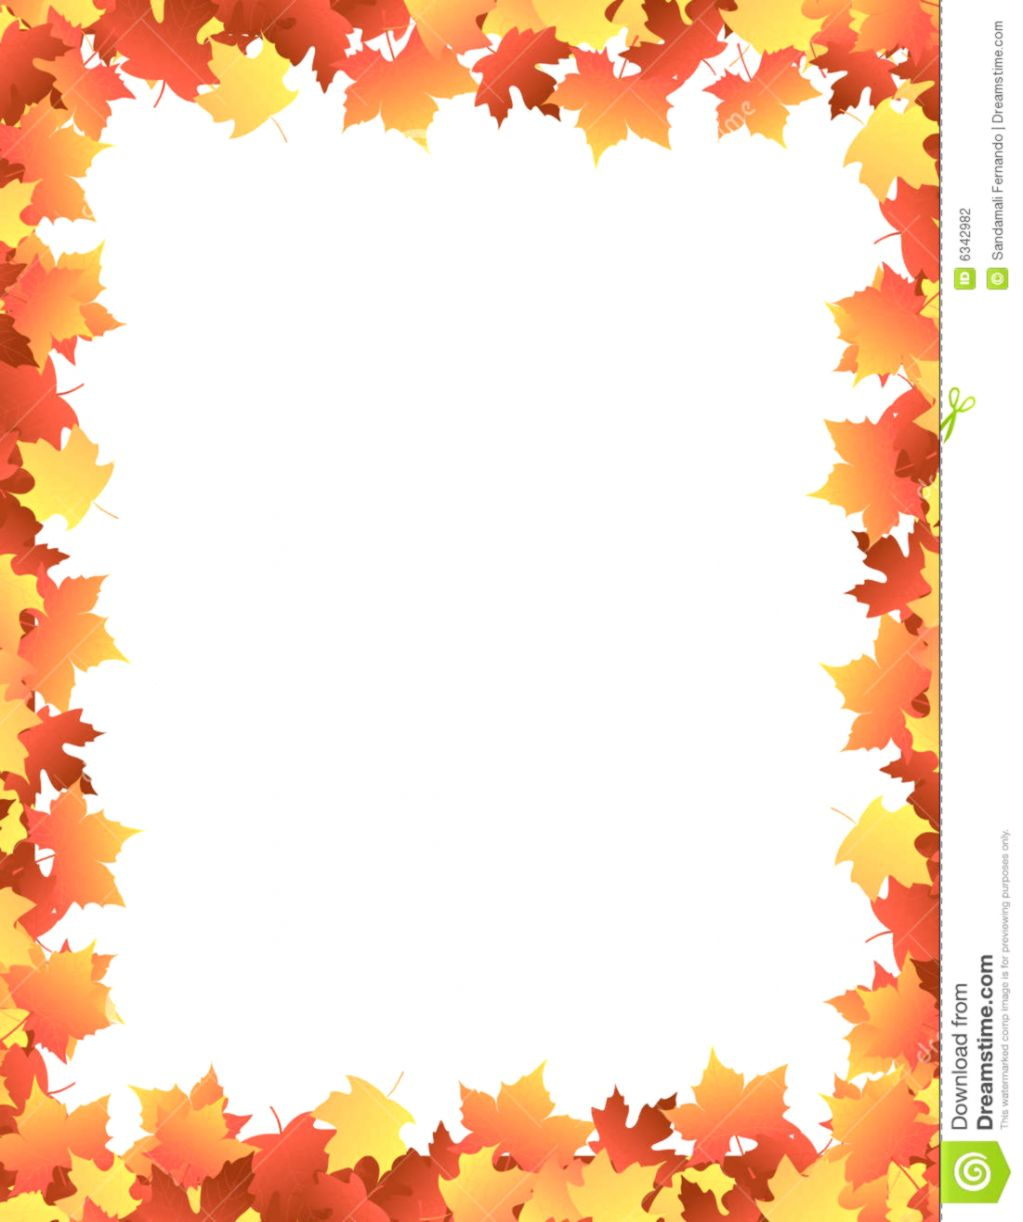 Autumn Leaves Border Clipart.